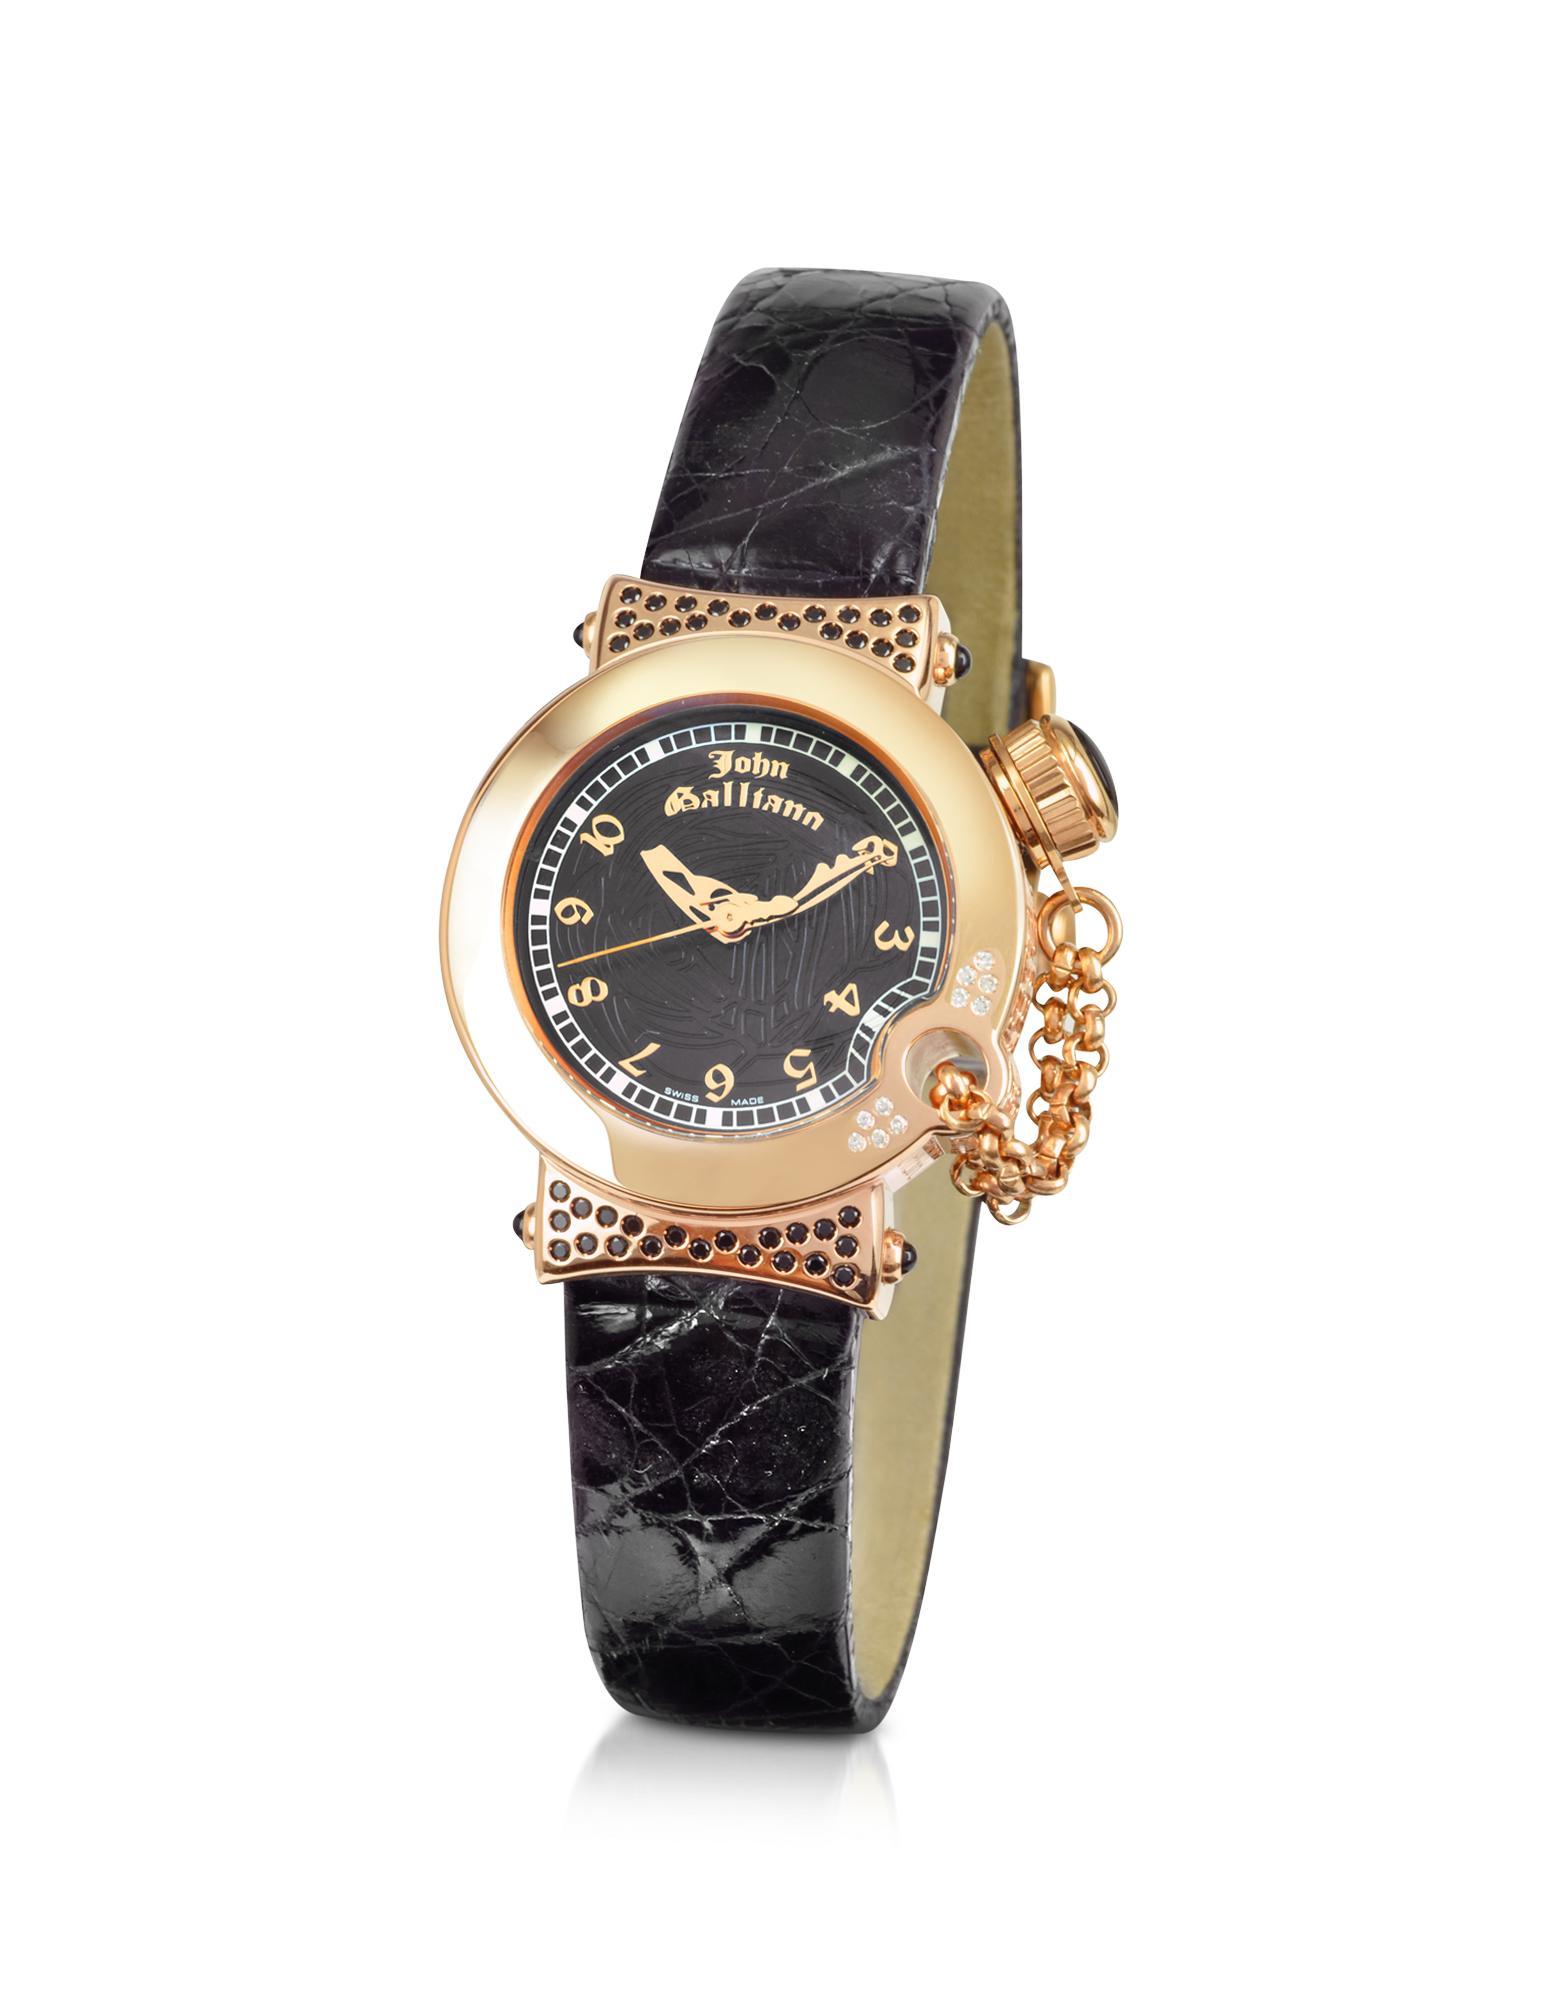 John Galliano  L'Elu - Ladies' Diamond Gold Plated Dress Watch